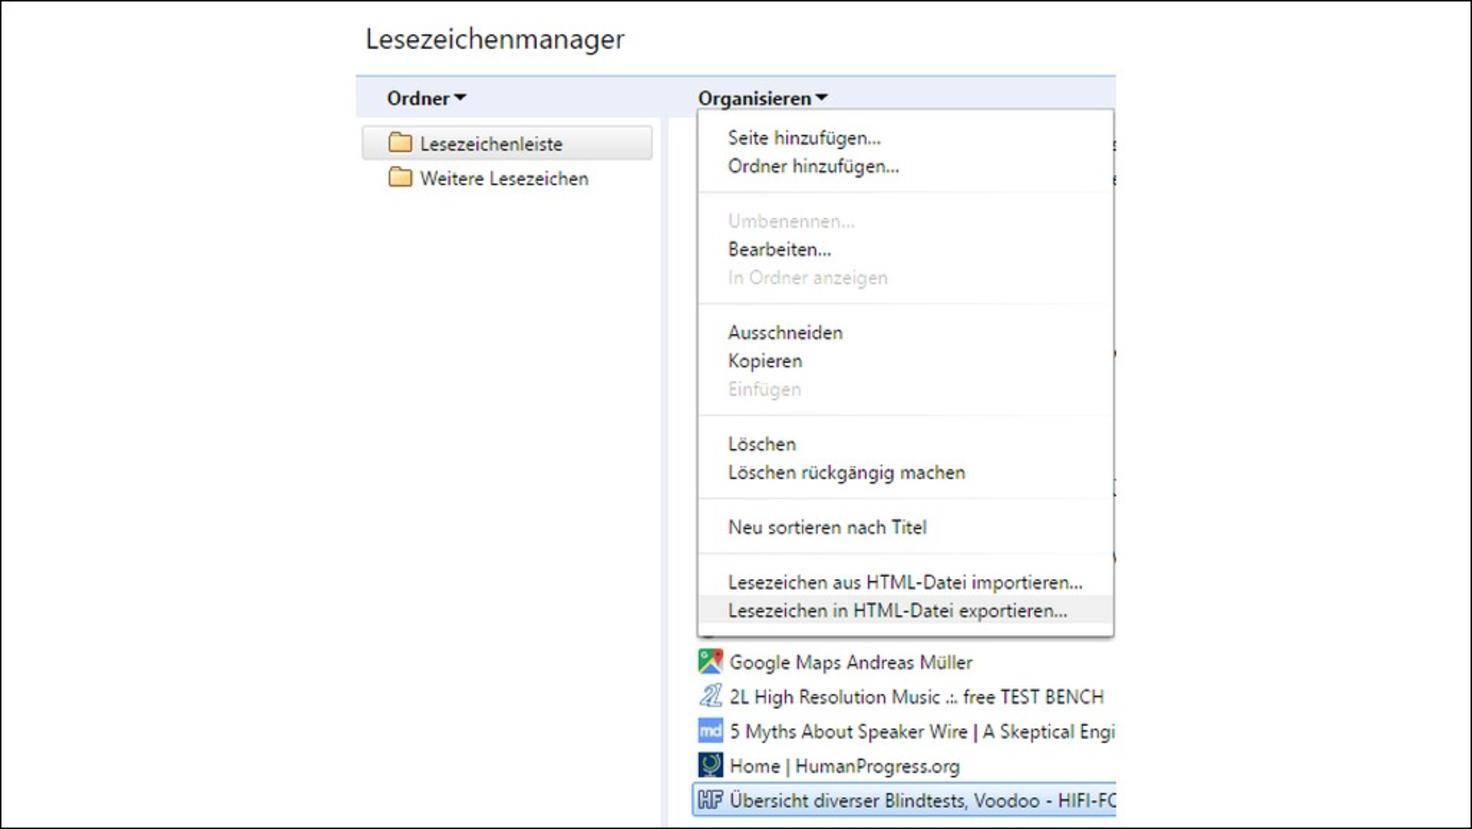 Chrome-Lesezeichenmanager-Exportieren